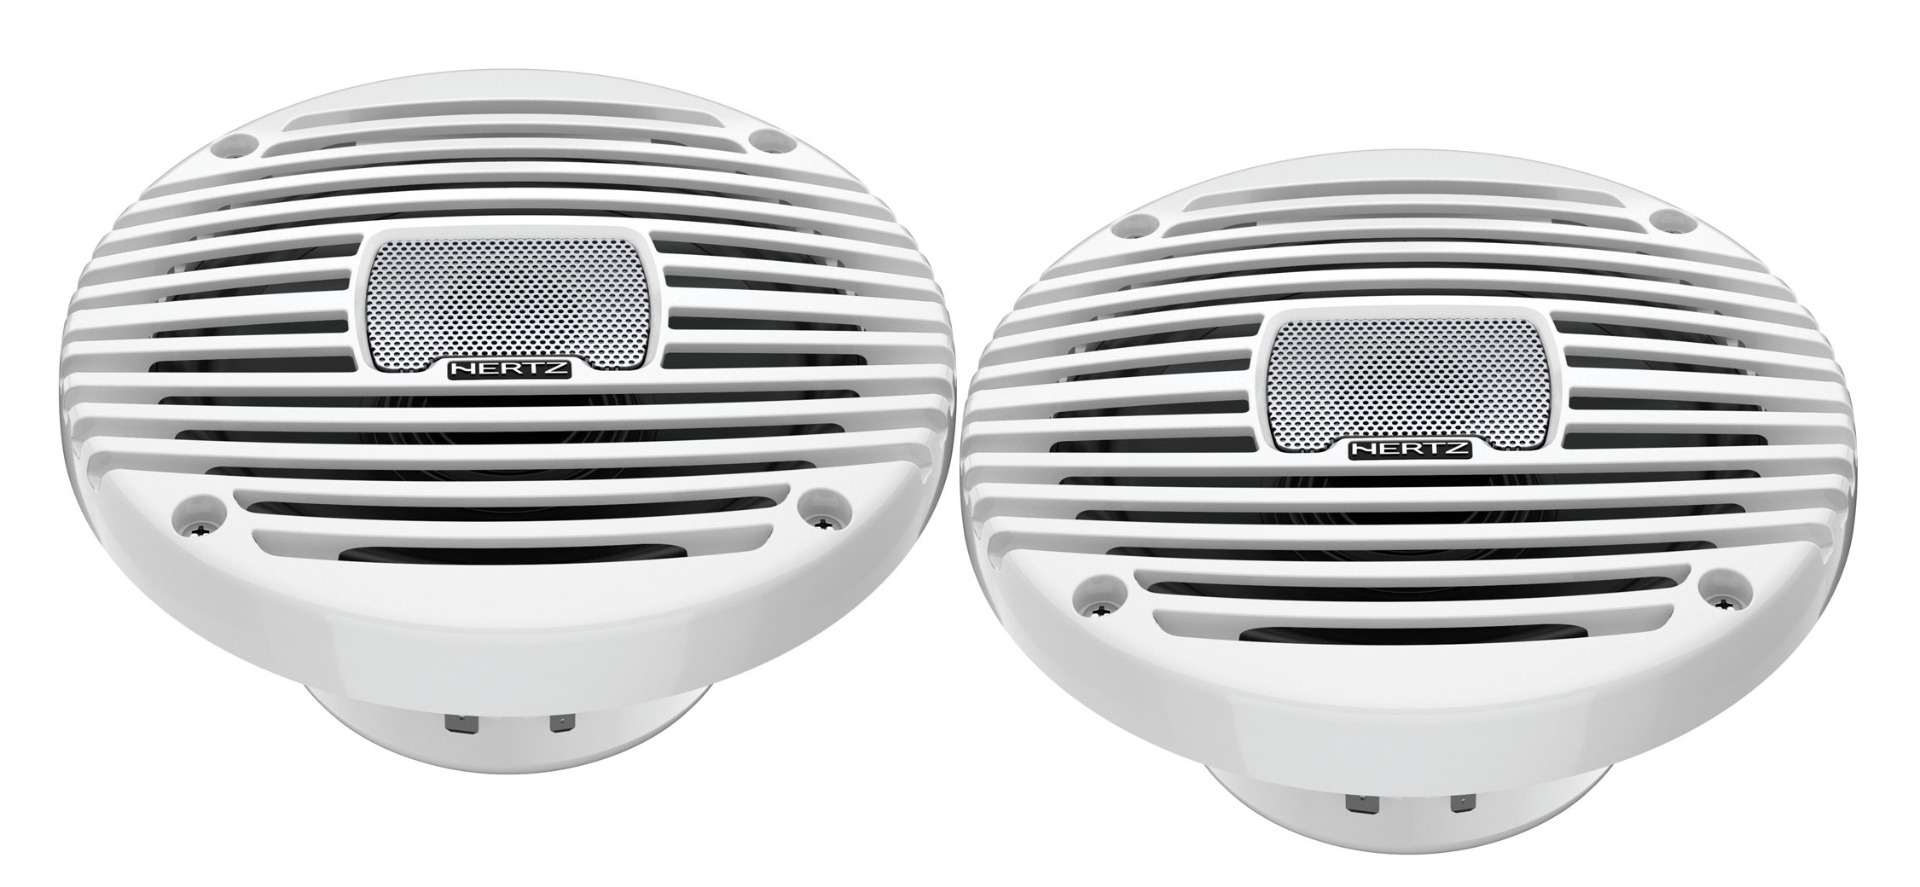 "Hertz HEX 6.5 M-W MARINE 6.5"" COAX SET- WHITE Marine/ Outdoor Lautsprecher 1 Paar 16,5cm"